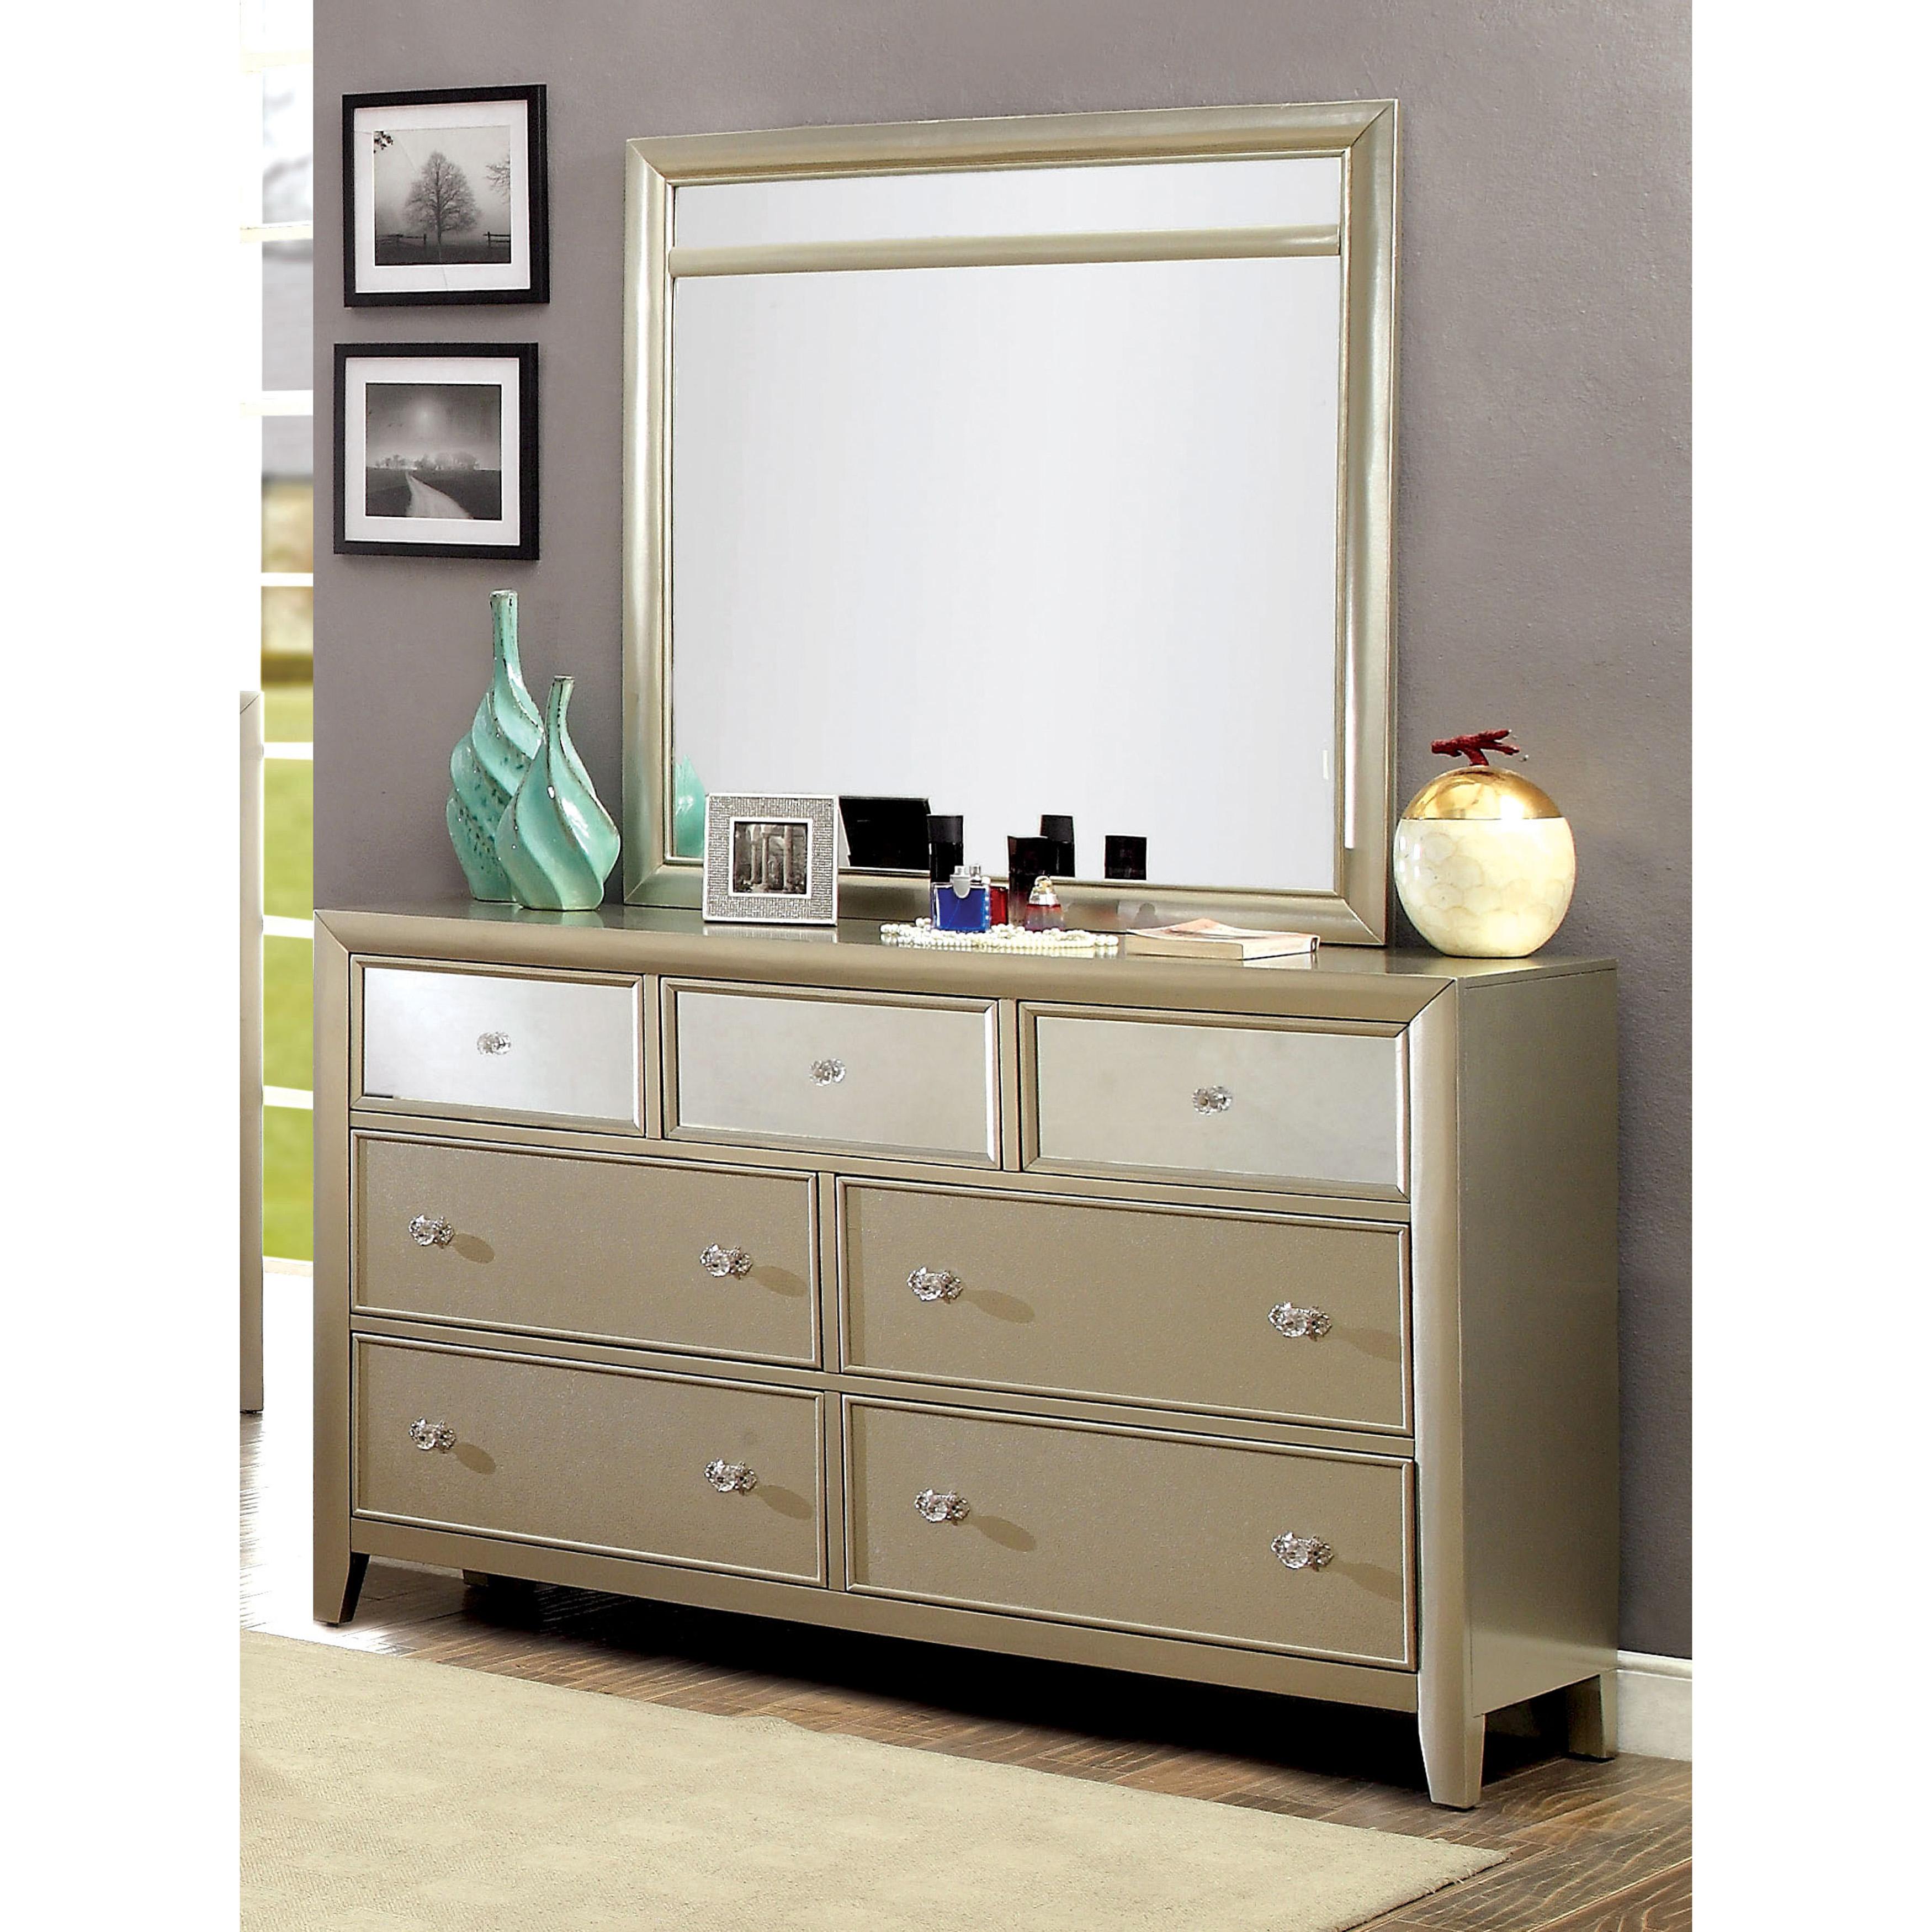 Acrylic Bedroom Furniture  Kmartcom